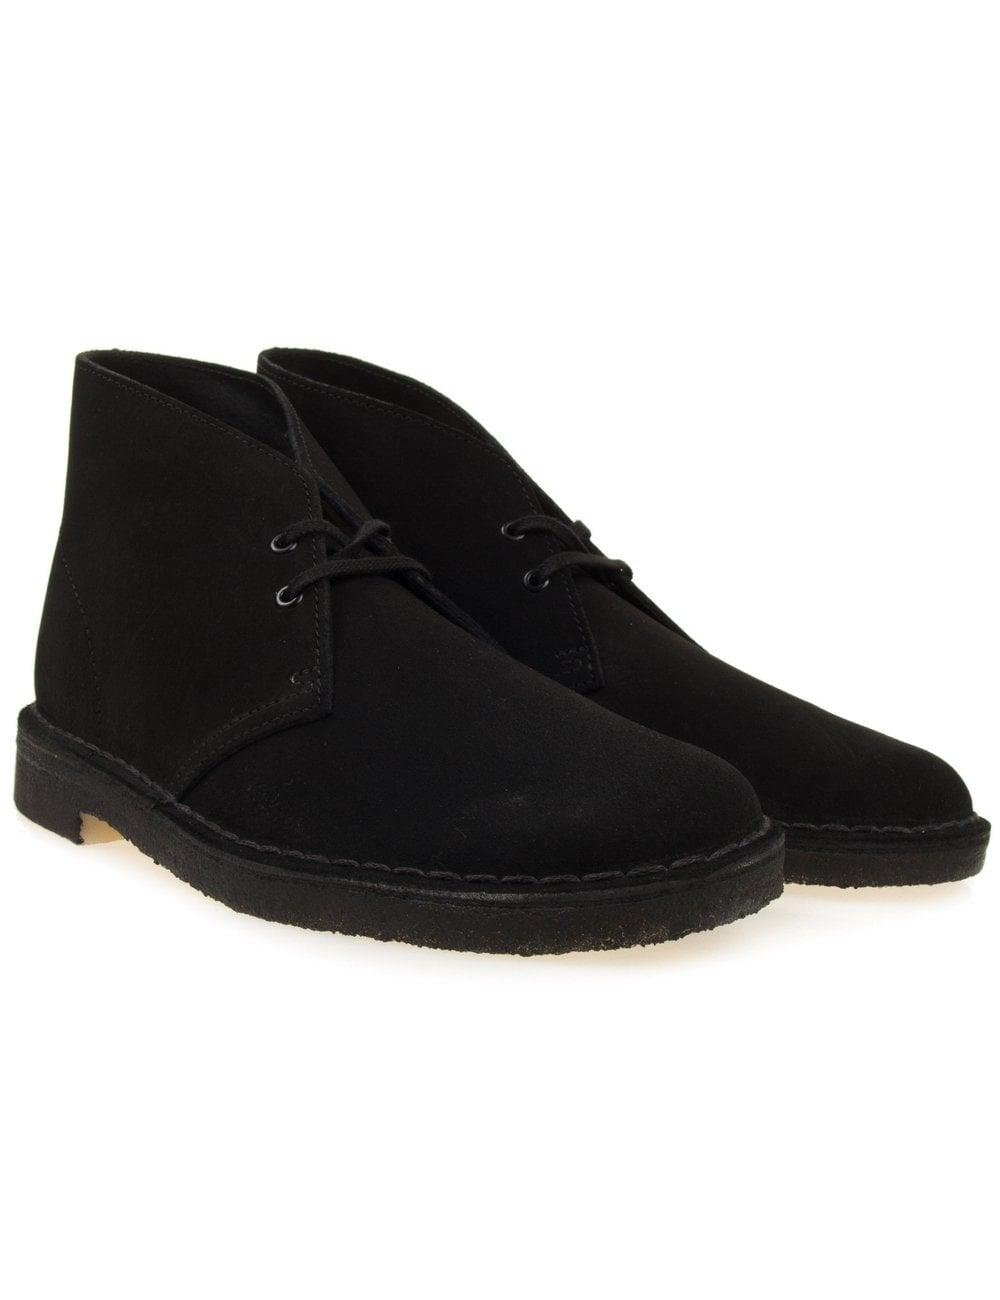 b46ee6e84bcd3 Clarks Originals Desert Boot - Black Suede - Footwear from Fat ...